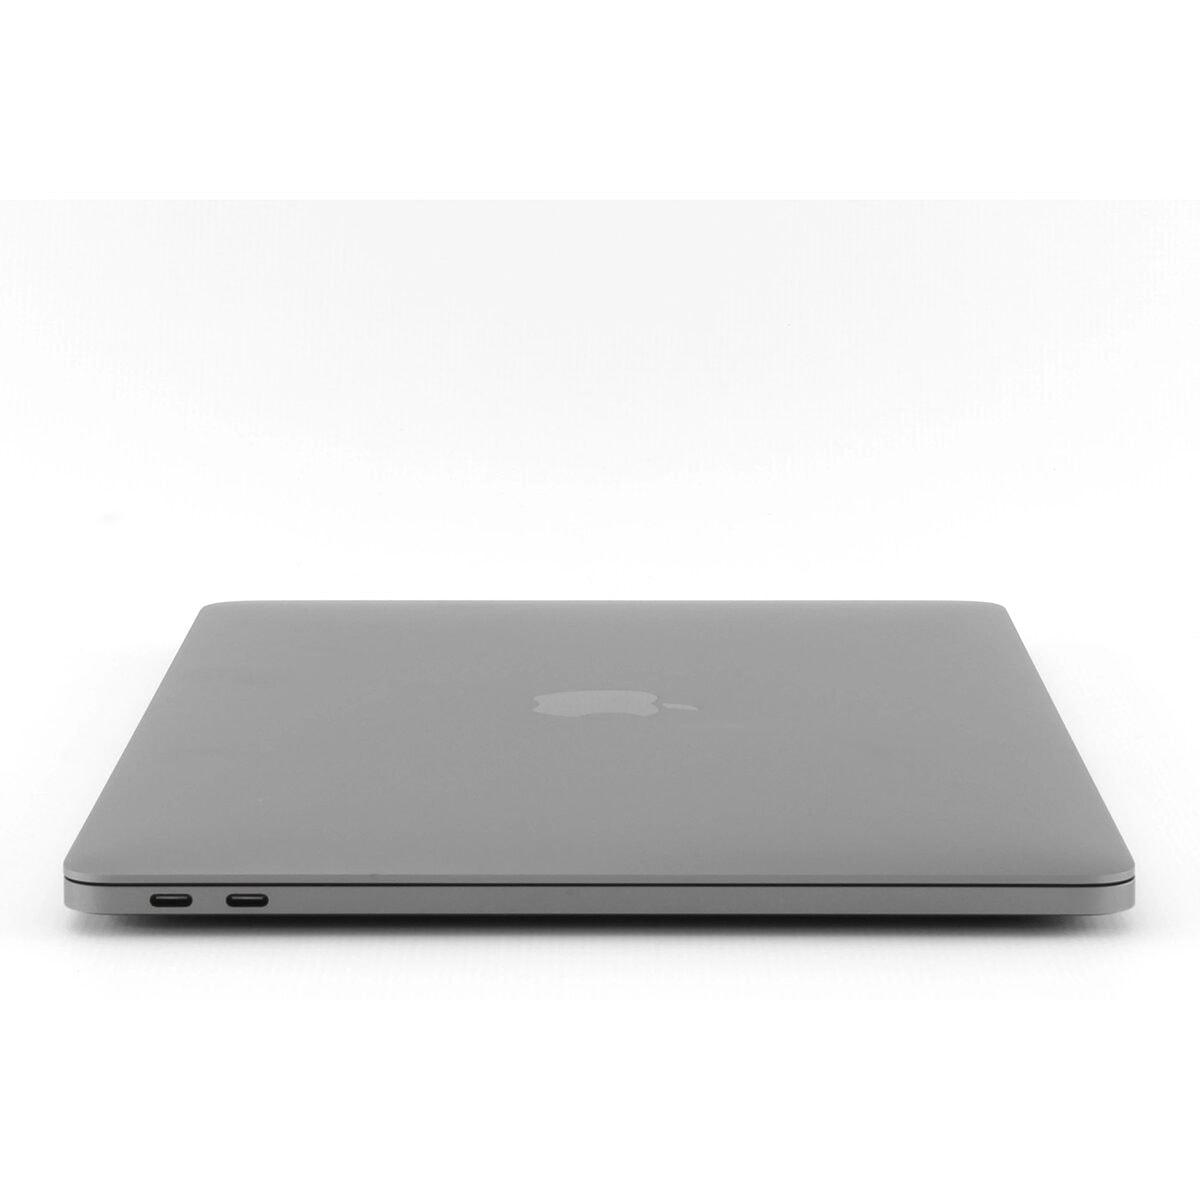 "Retina Apple Macbook Pro 13.3"" A1708 2017 Powerful Core i5 128GB SSD 8GB RAM Mac Laptop OS Big Sur Space Grey"